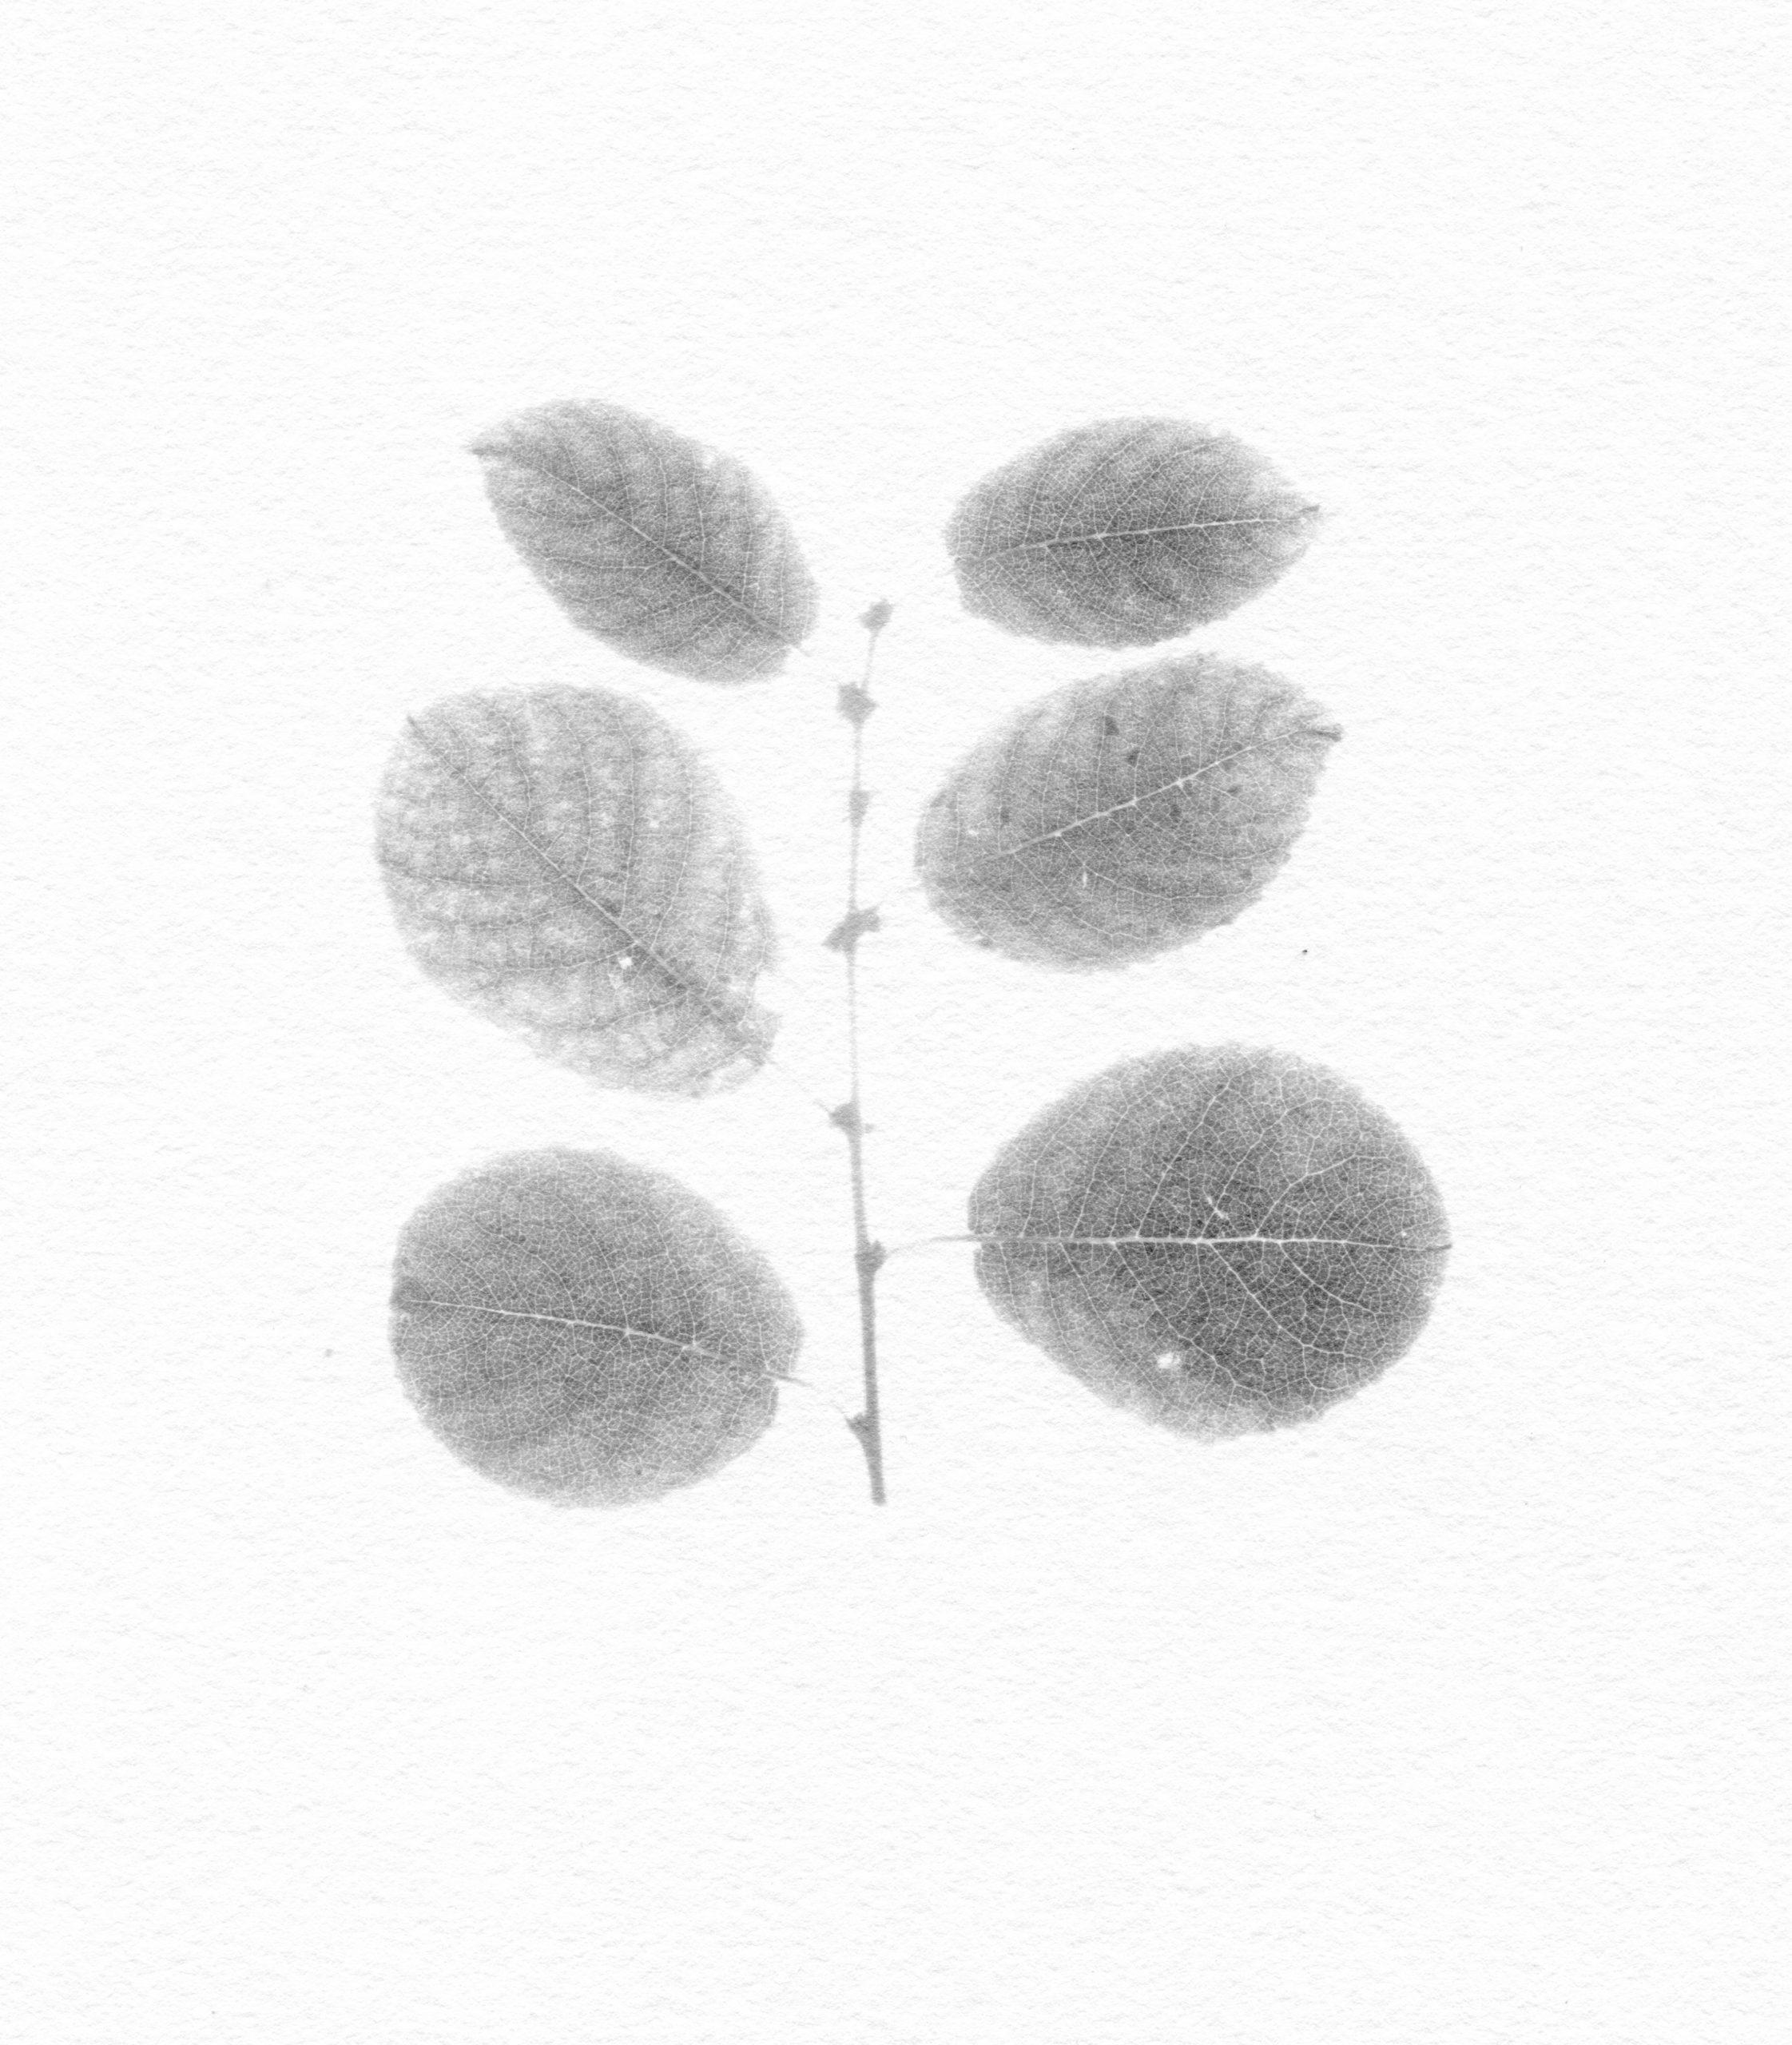 Nicholas Fisher, Salix x latifolia (Goat Willow x Dark-leaved Willow)